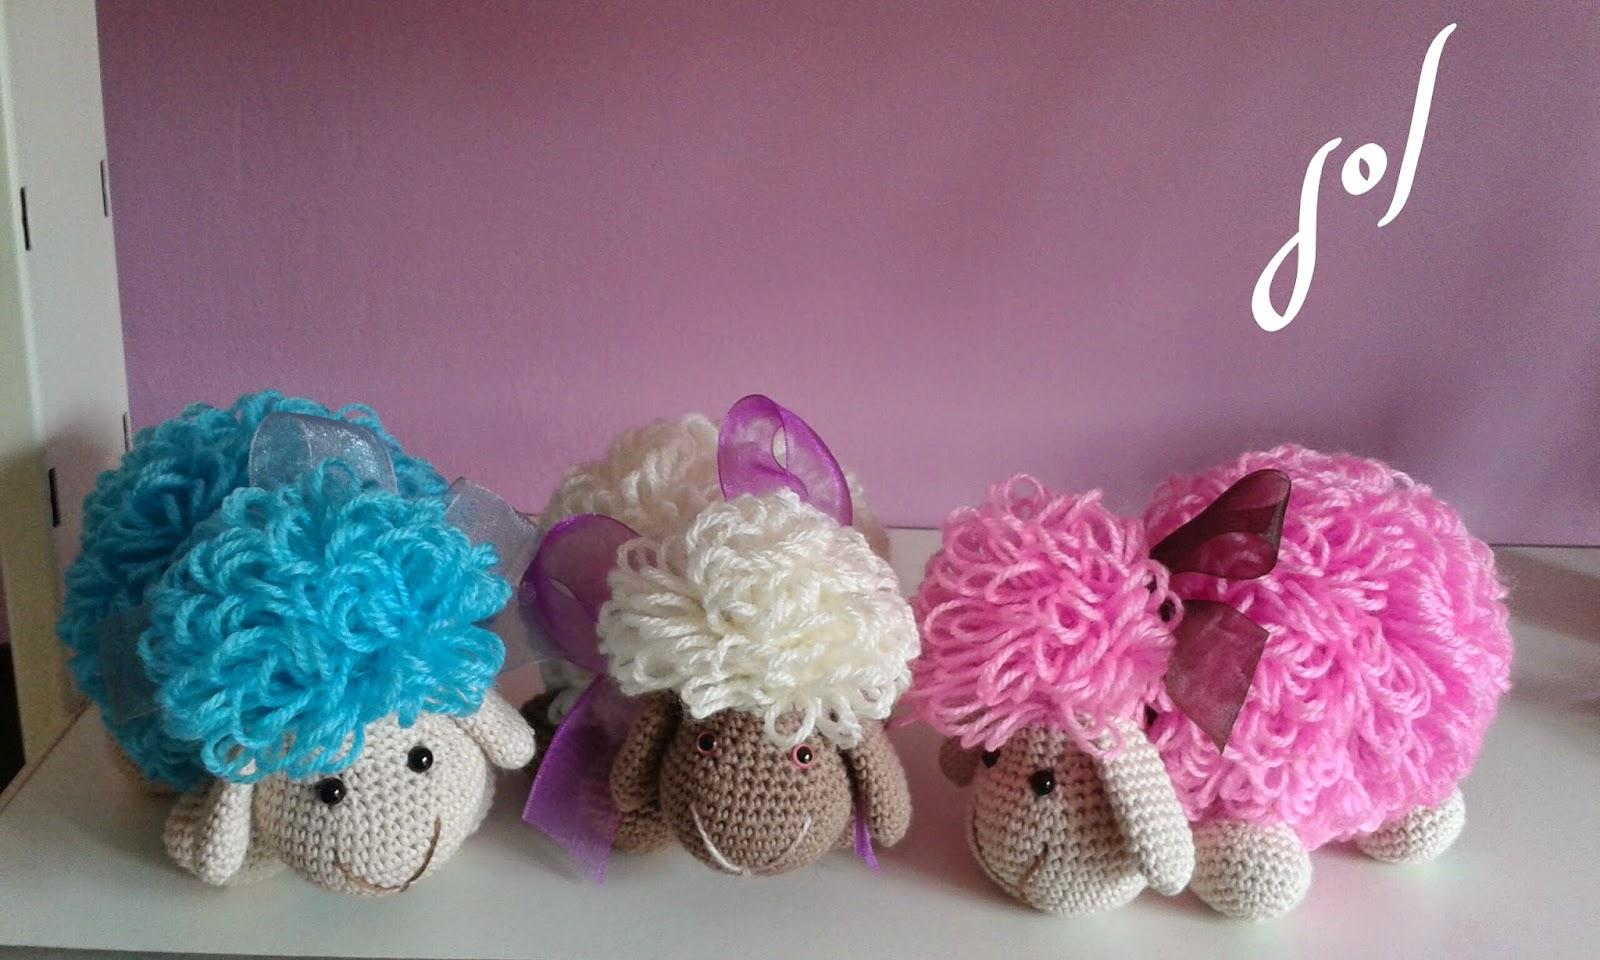 Tejiendoperu Crochet Amigurumis : Flores rellenas al crochet amigurumi flowers crochet y dos